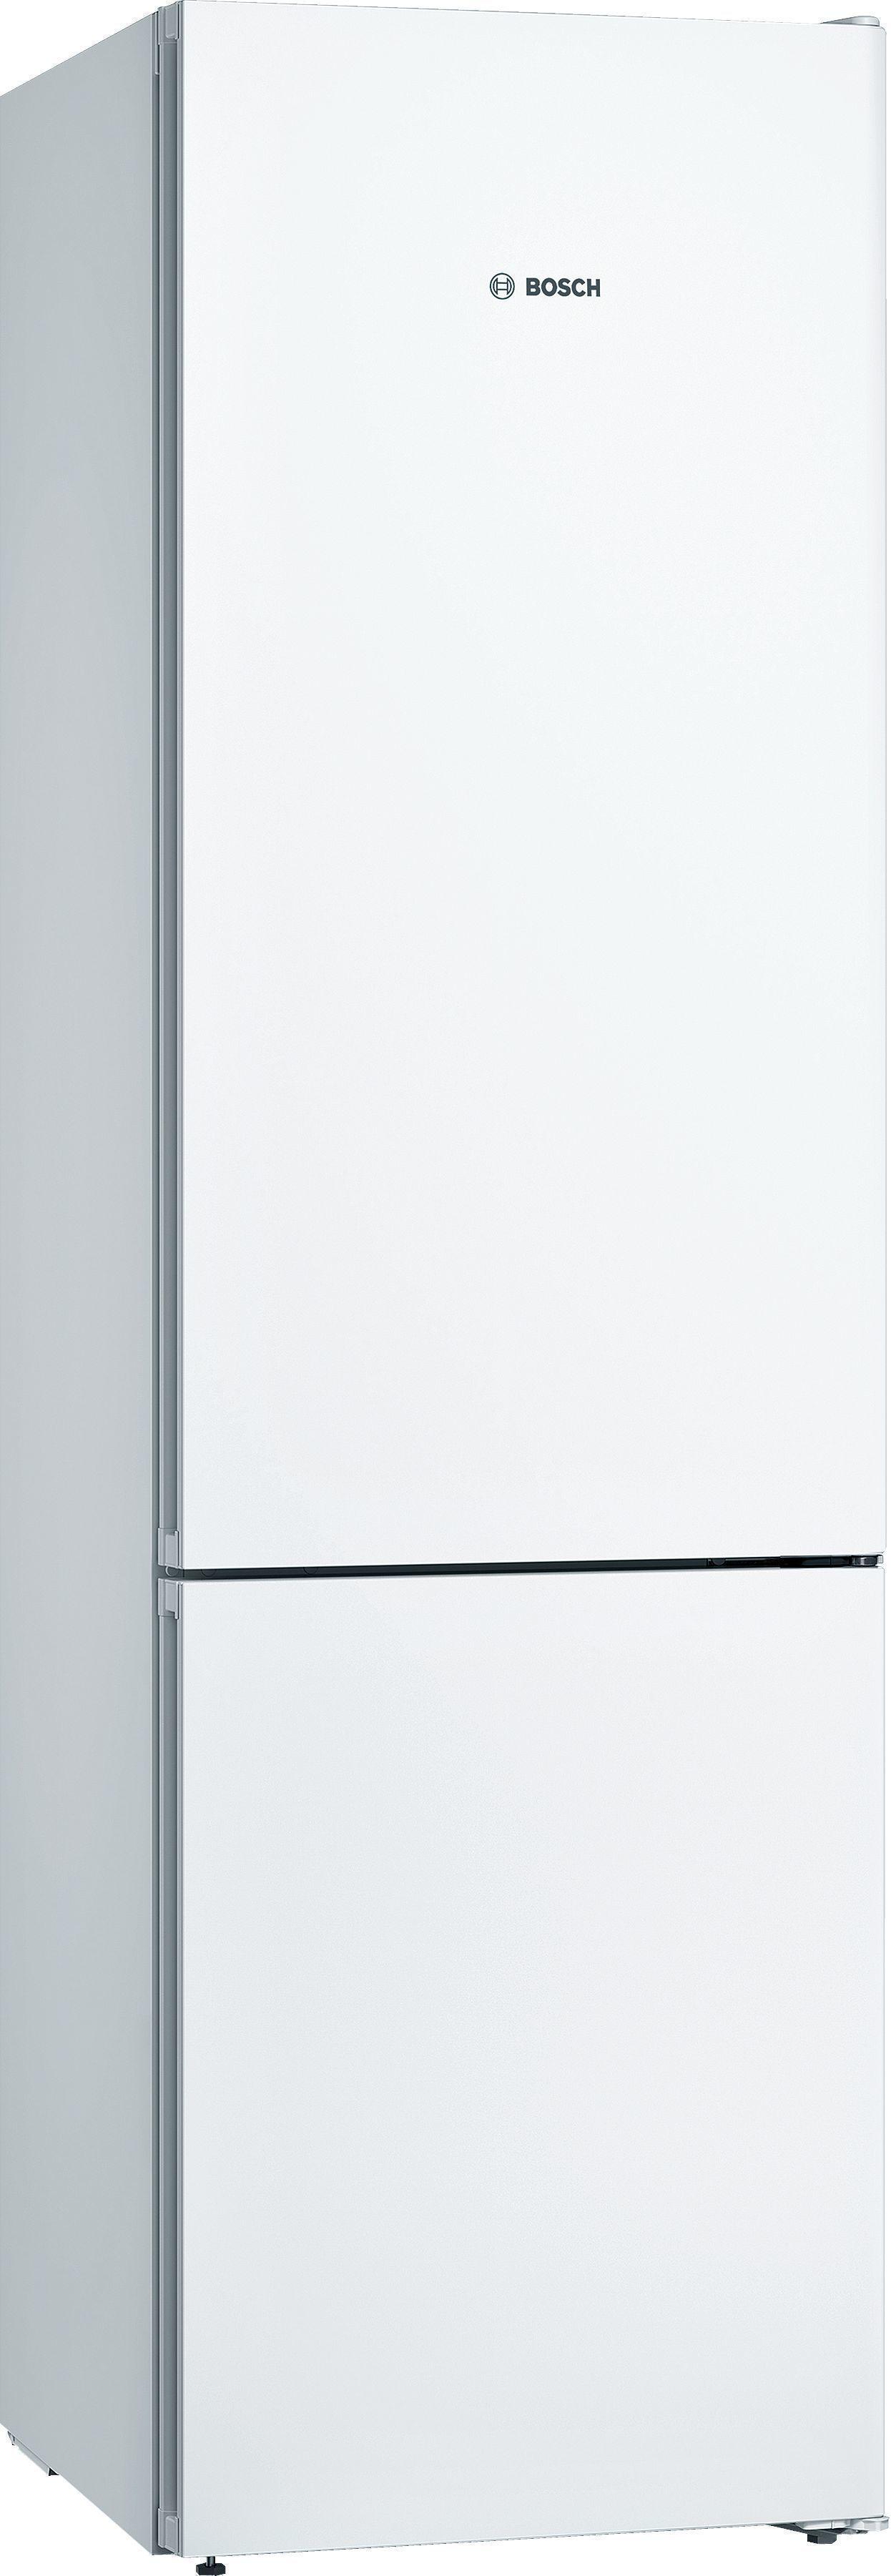 Frigorifico Bosch KGN39VWDA Combi 203 Nf A+++